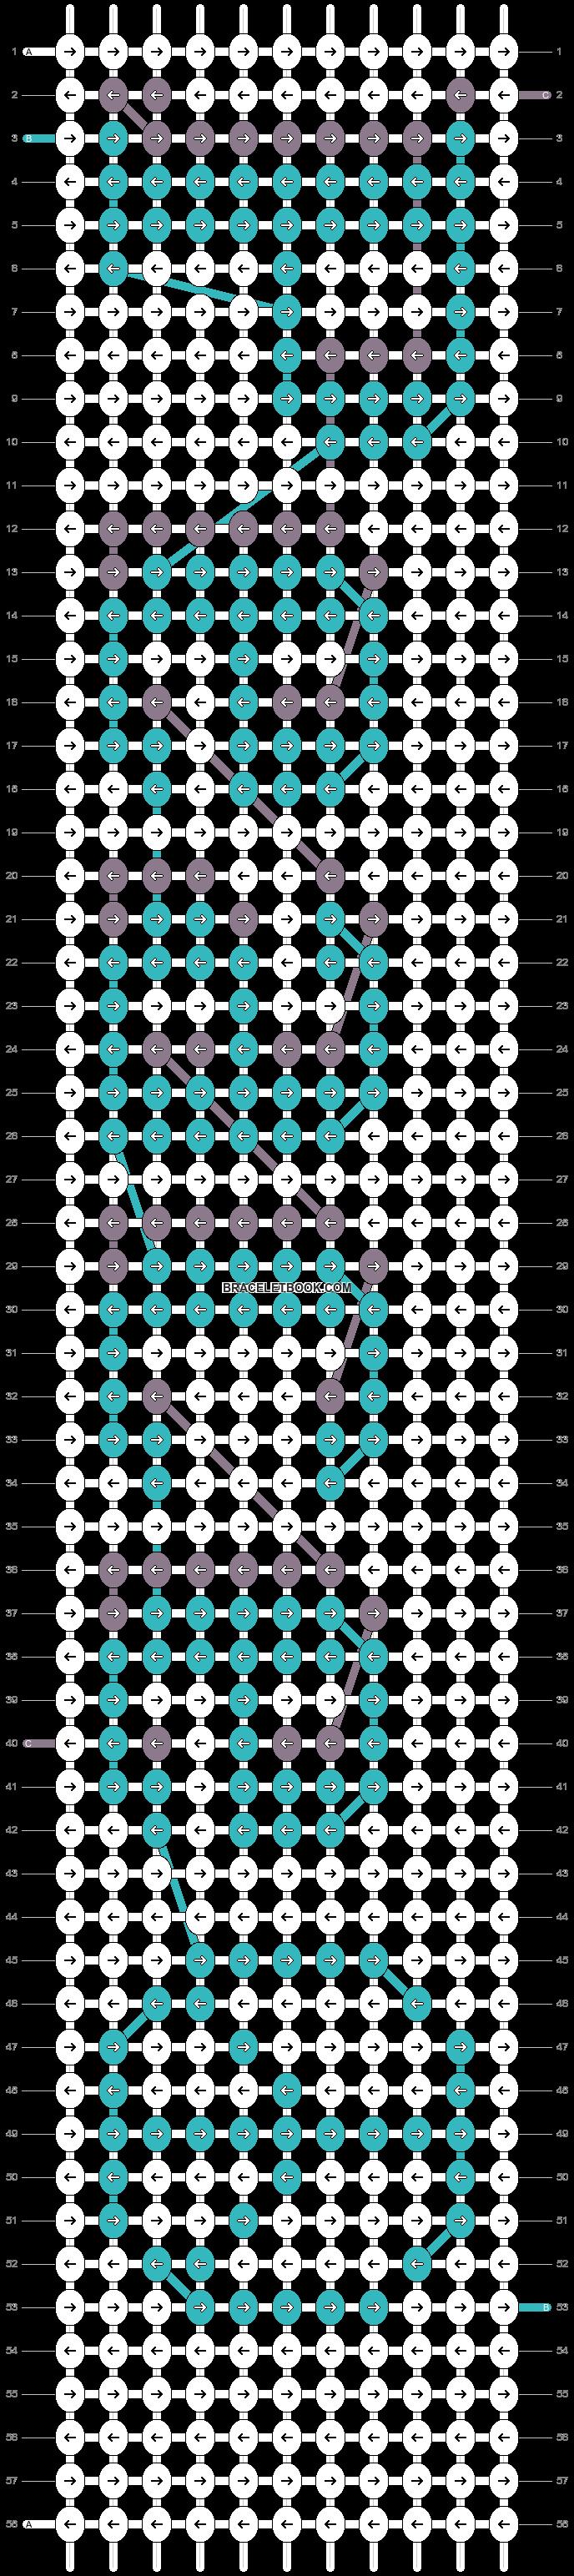 Alpha pattern #21467 pattern